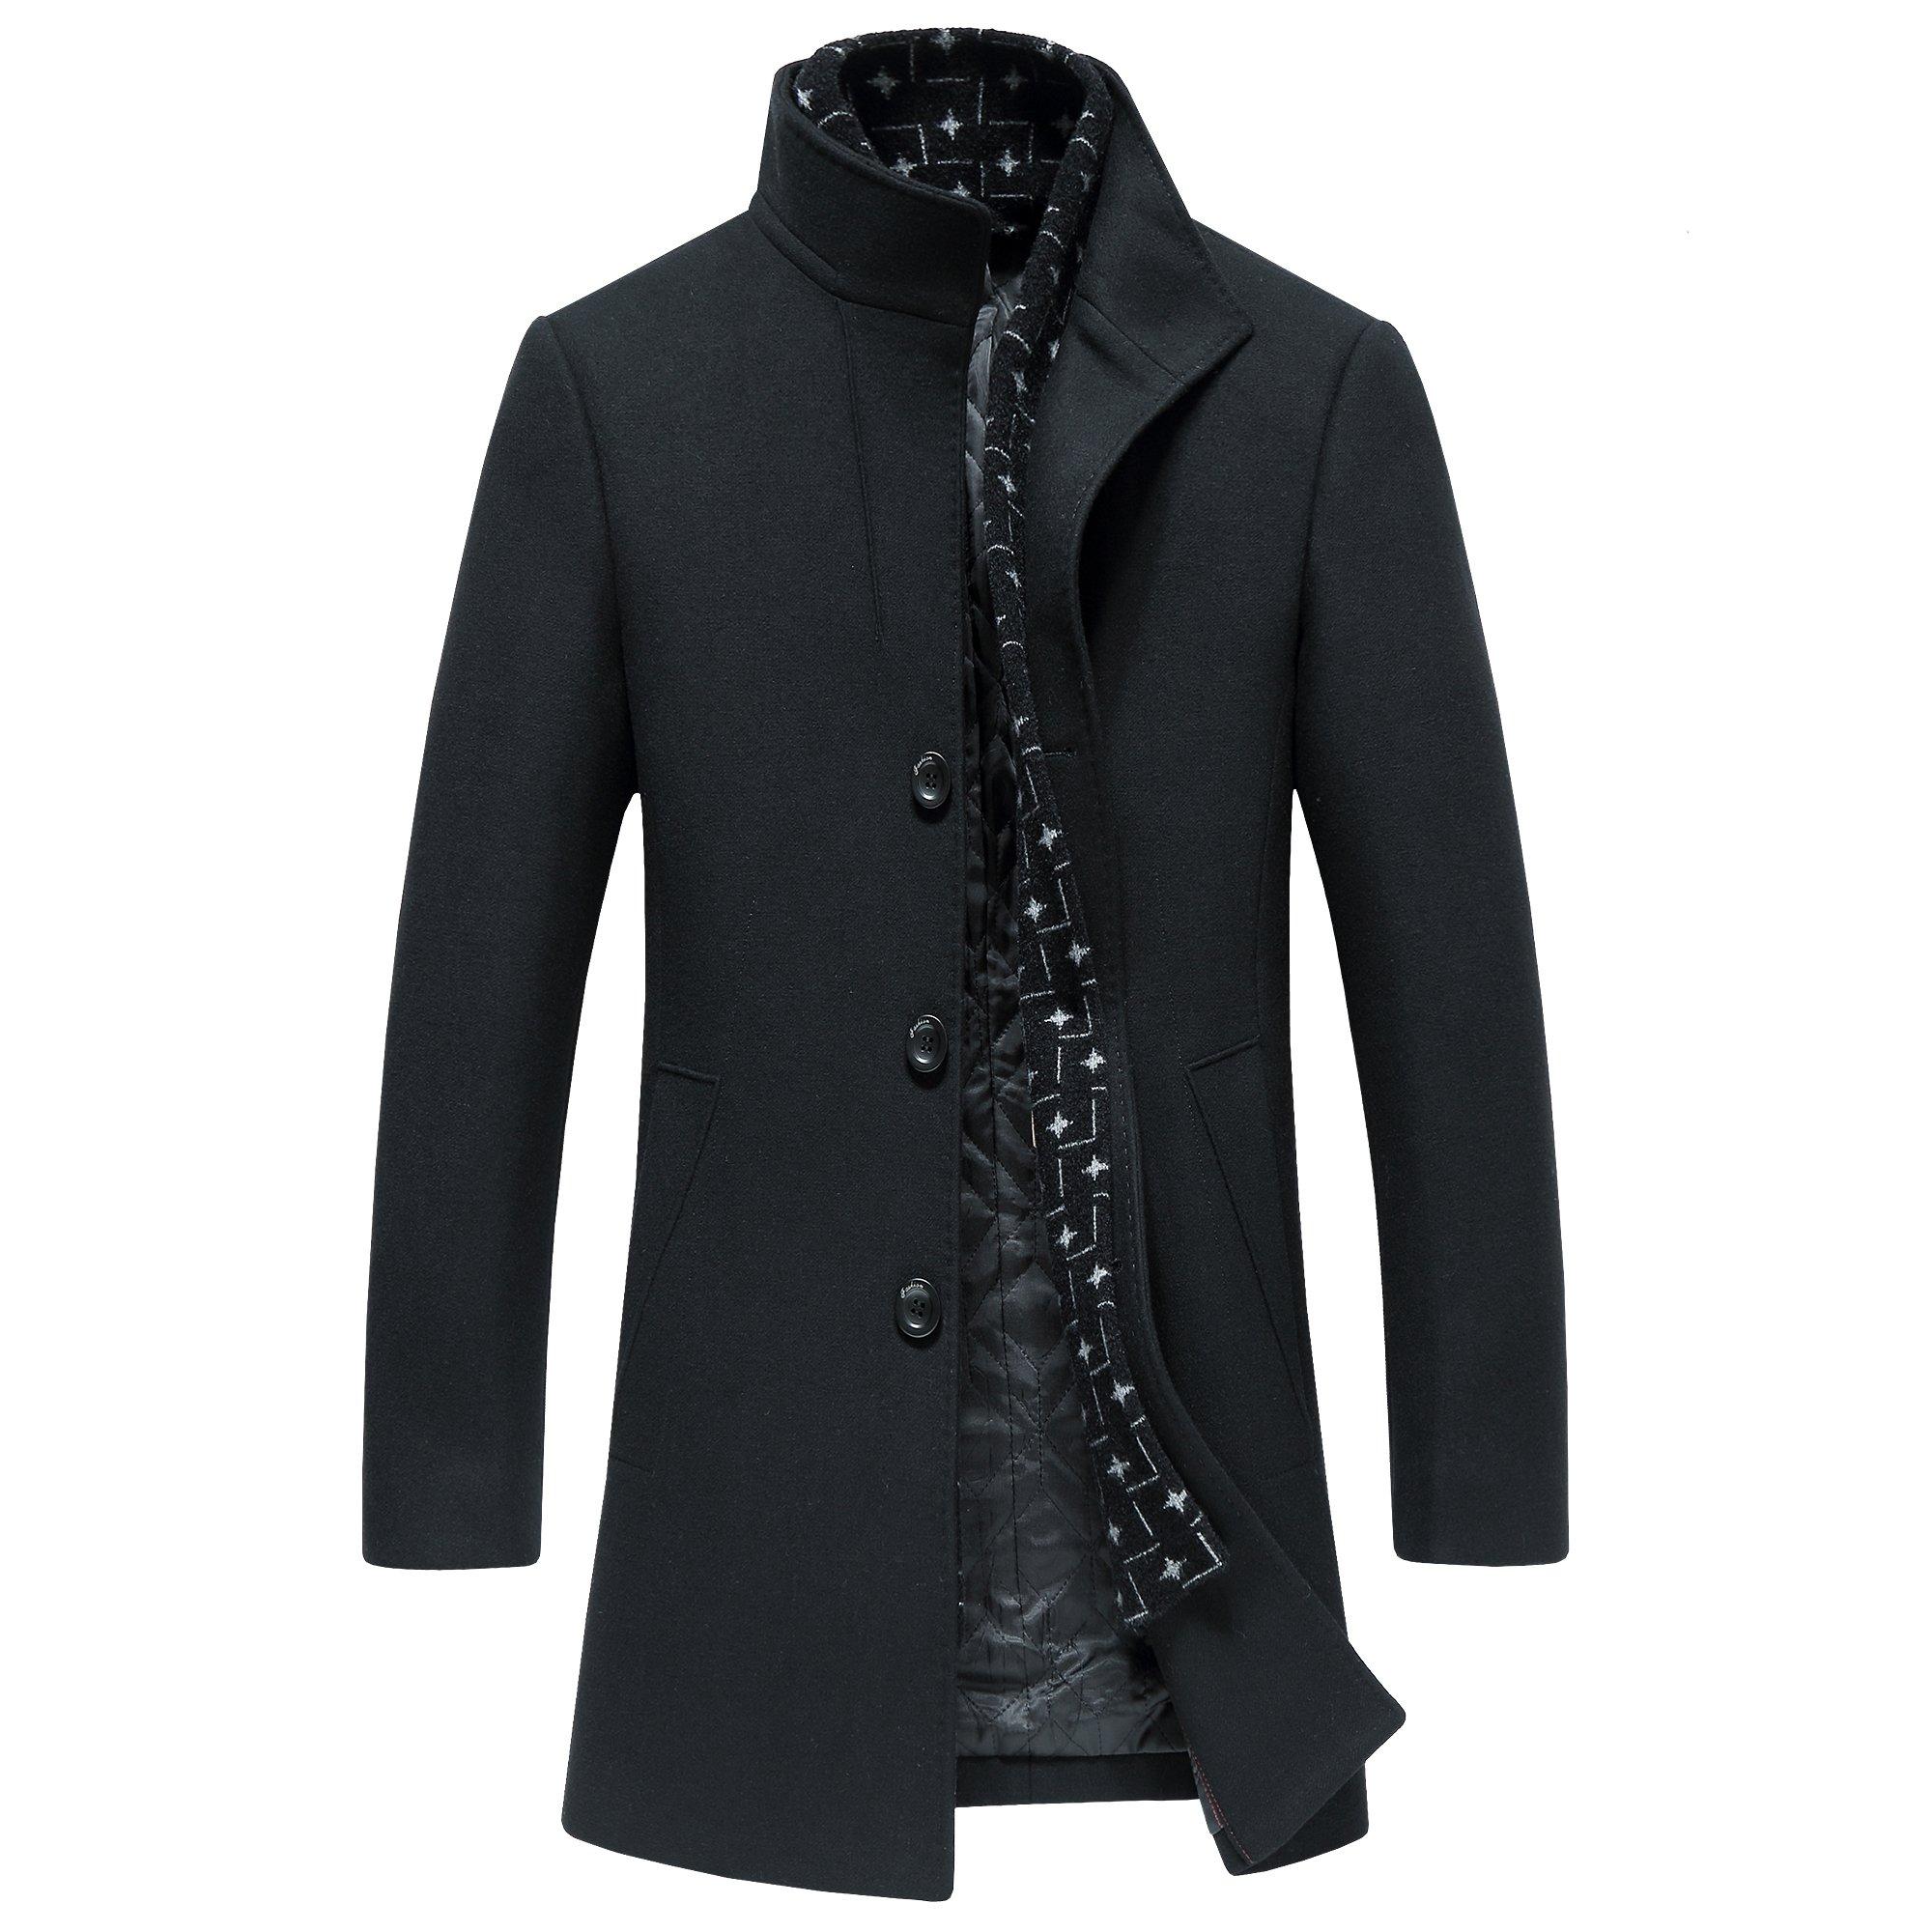 Men's Wool Long Trench Coat Winter Wool Blends Tweed Jackets Warm With Detachable Scarf (XXXL, 8725BLACK)